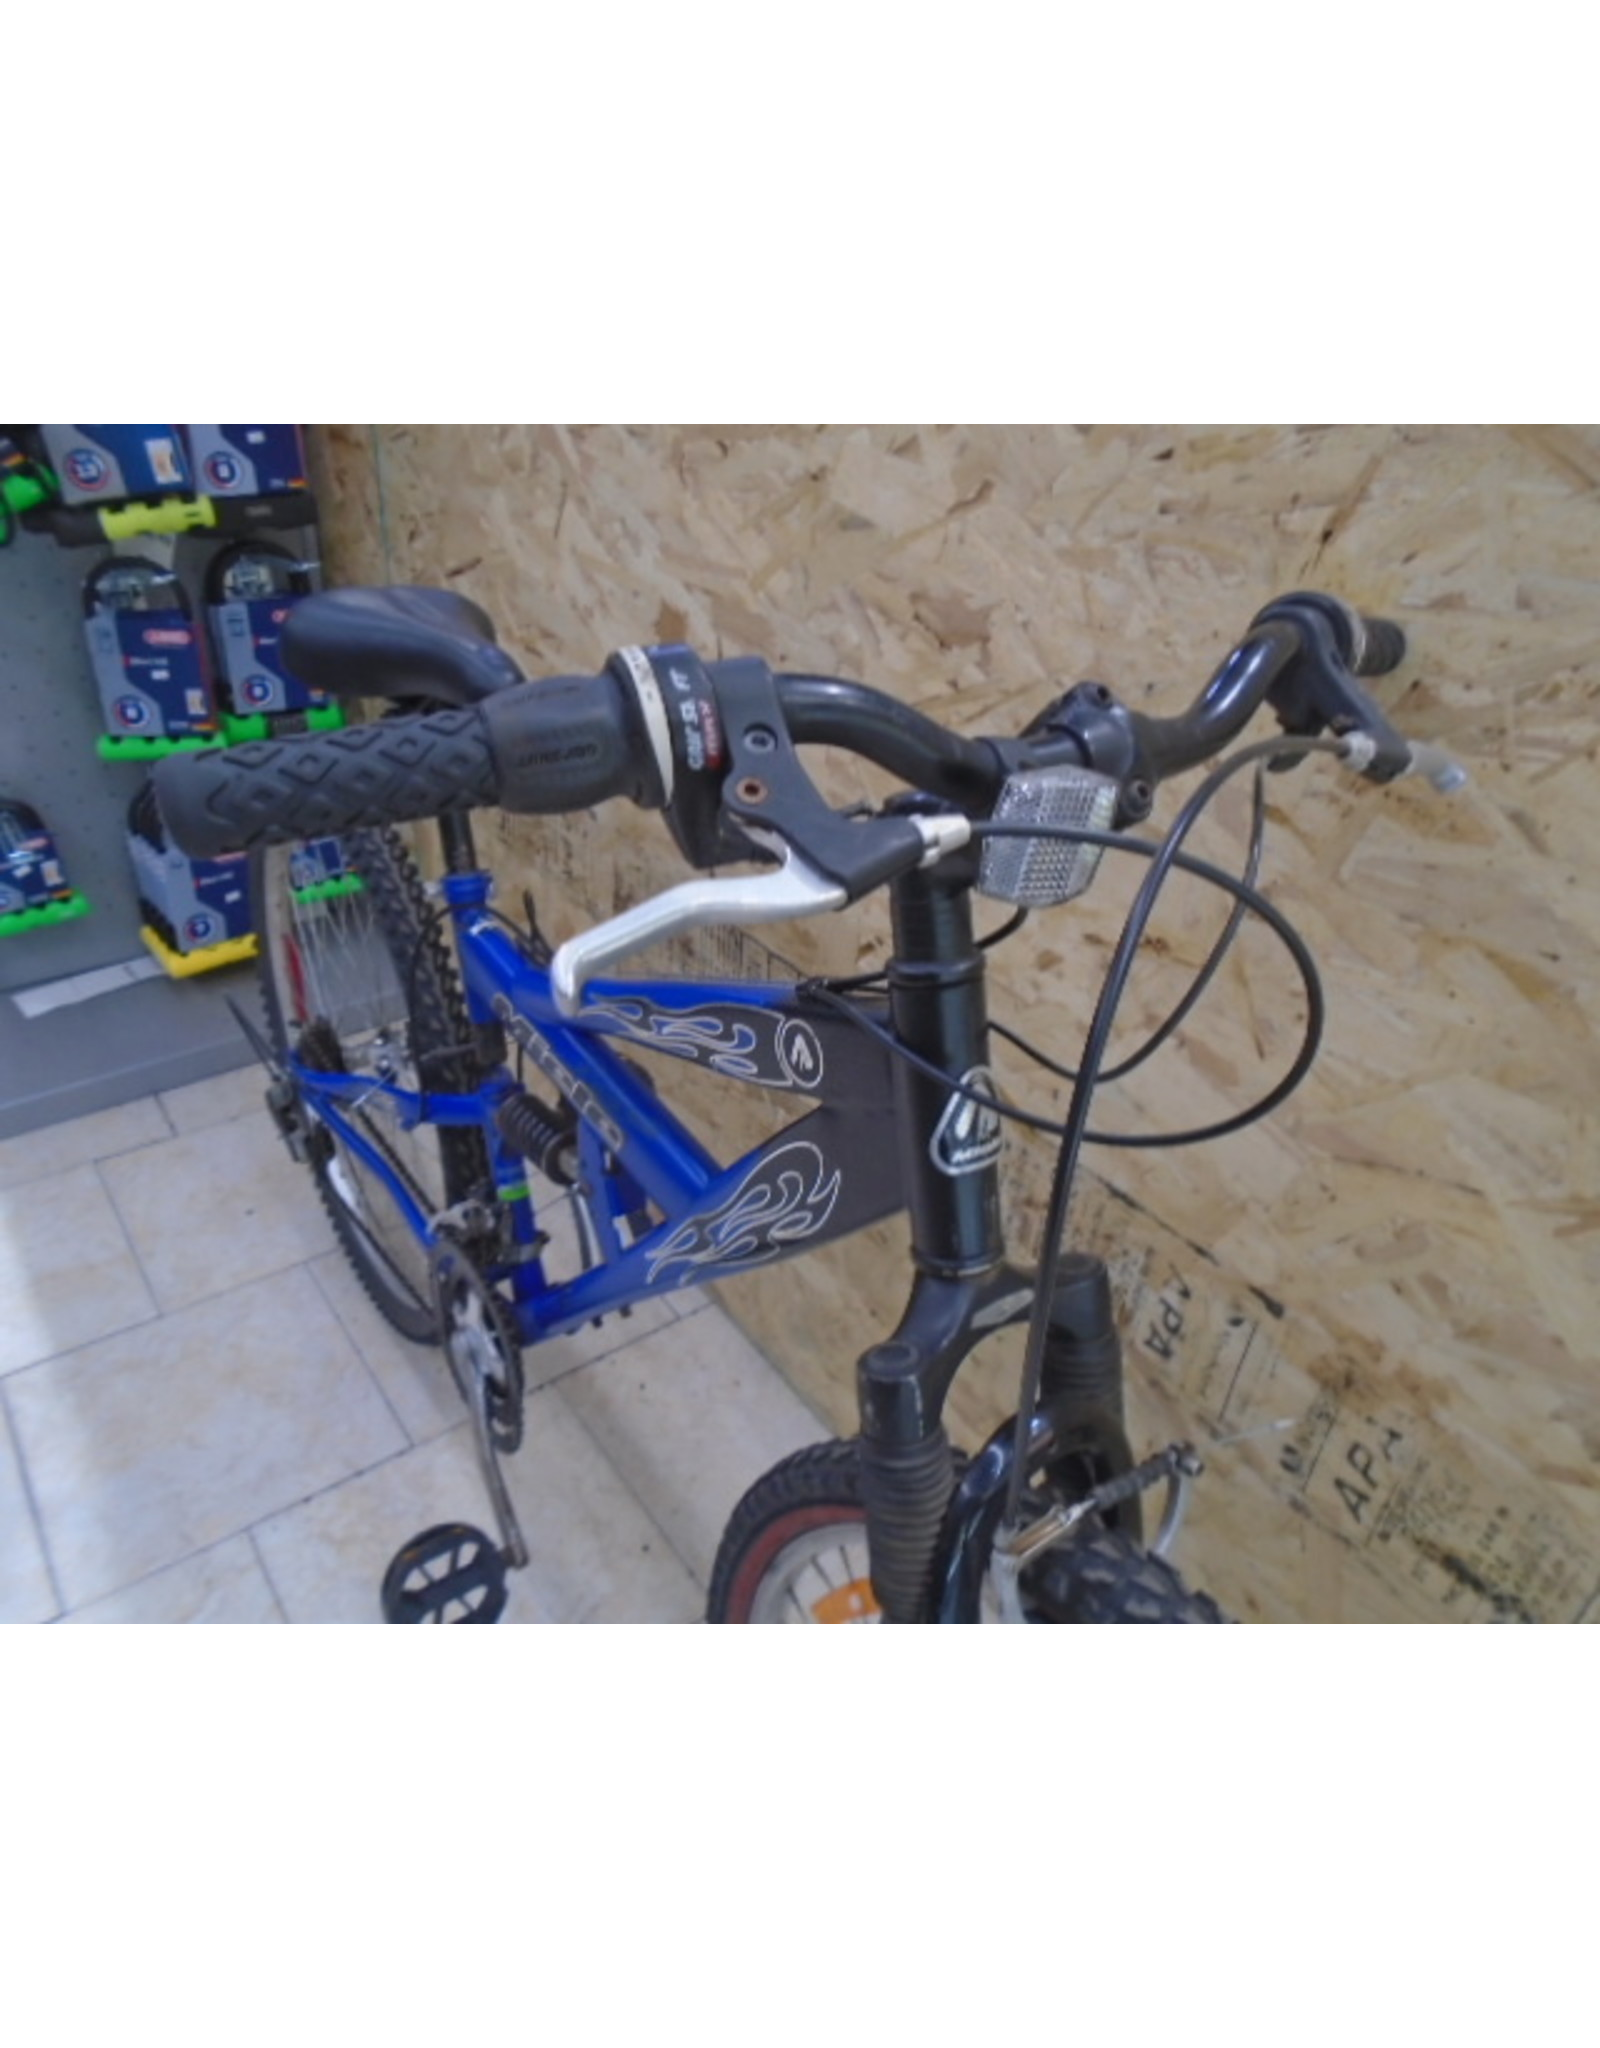 Vélo usagé de montagne Miele 16'' - 6350